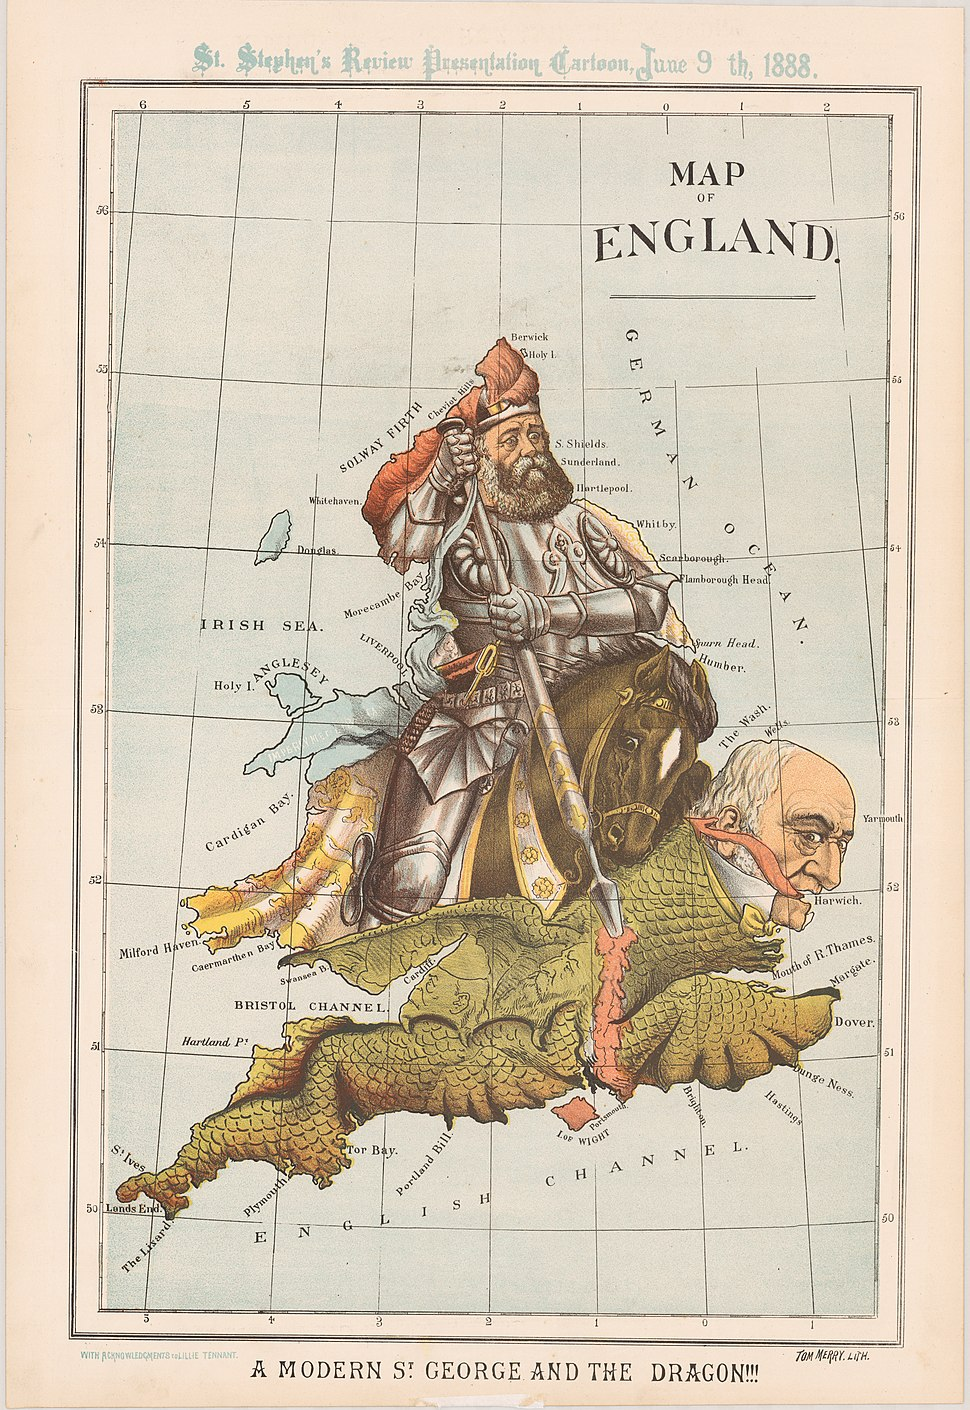 William Mecham Modern St. George and The Dragon 1888 Cornell CUL PJM 1100 01